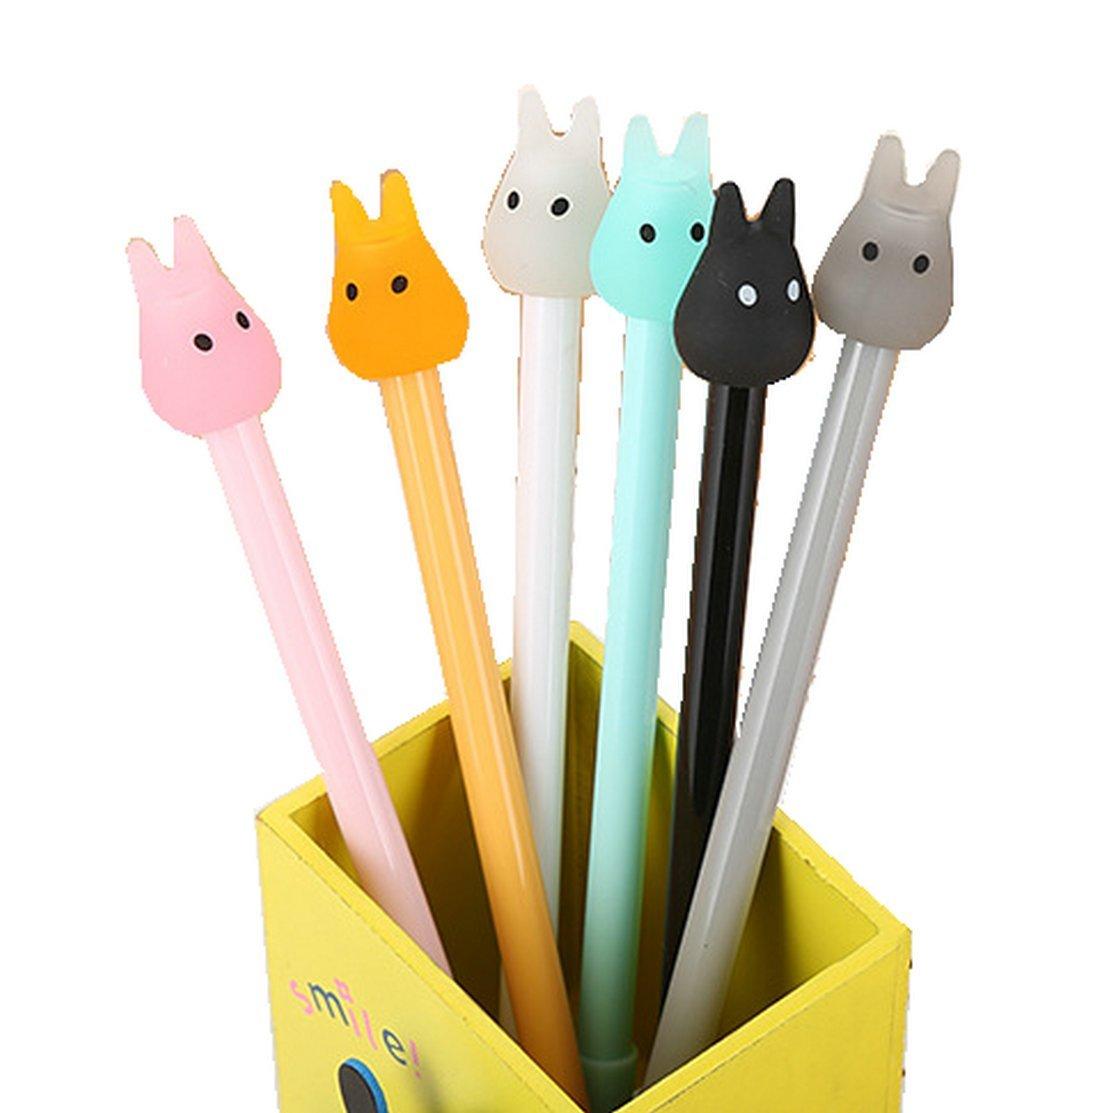 WIN-MARKET Gel Pens Set Fashion Cute Colorful Kawaii Lovely Cartoon Jelly color Totoro Gel Ball Pens Office School Stationery (8PCS)